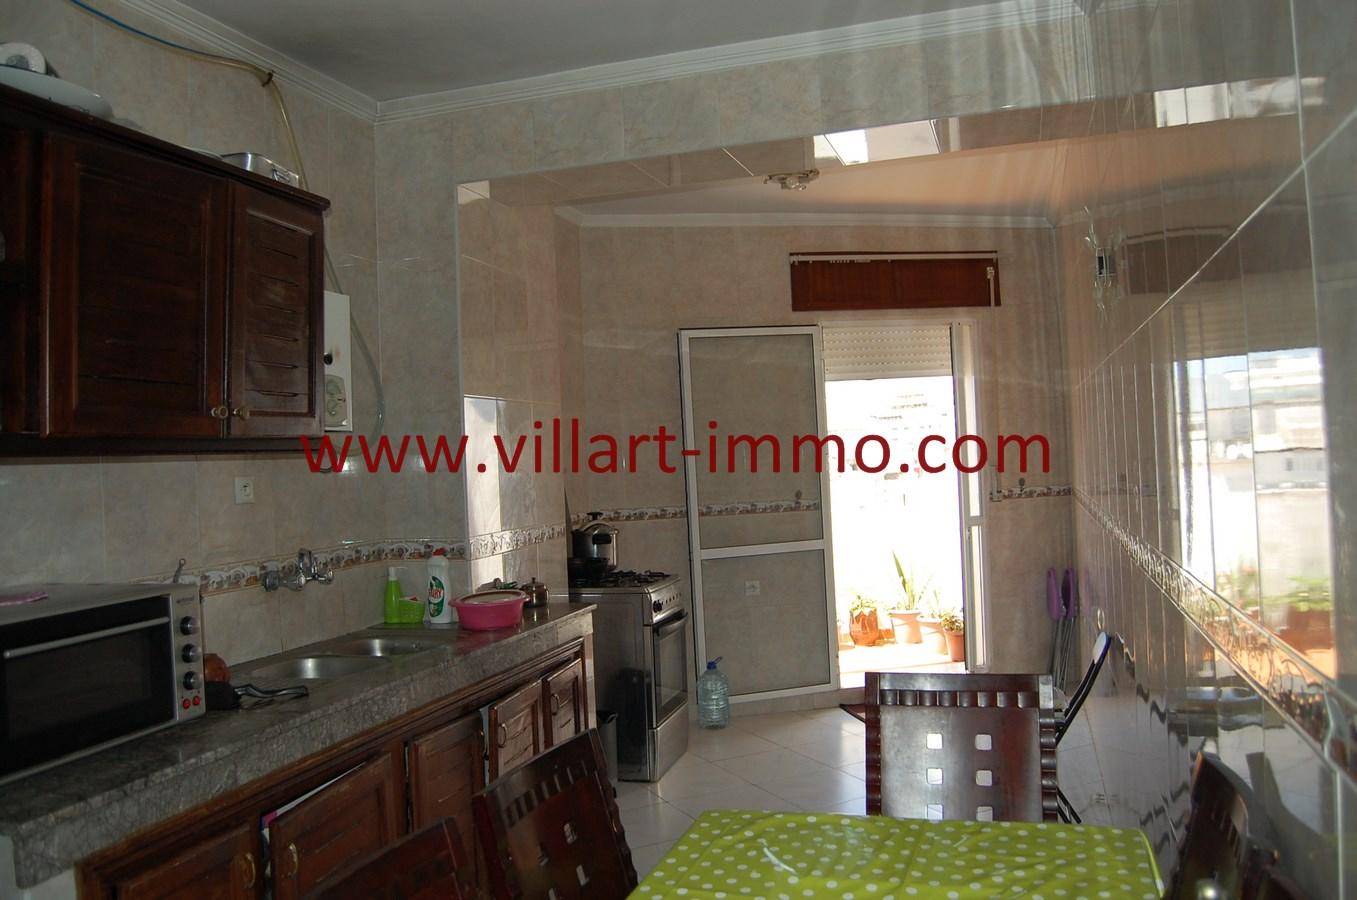 9-Vente-Appartement-Tanger-Centre-Ville-Cuisine-VA505-Villart Immo